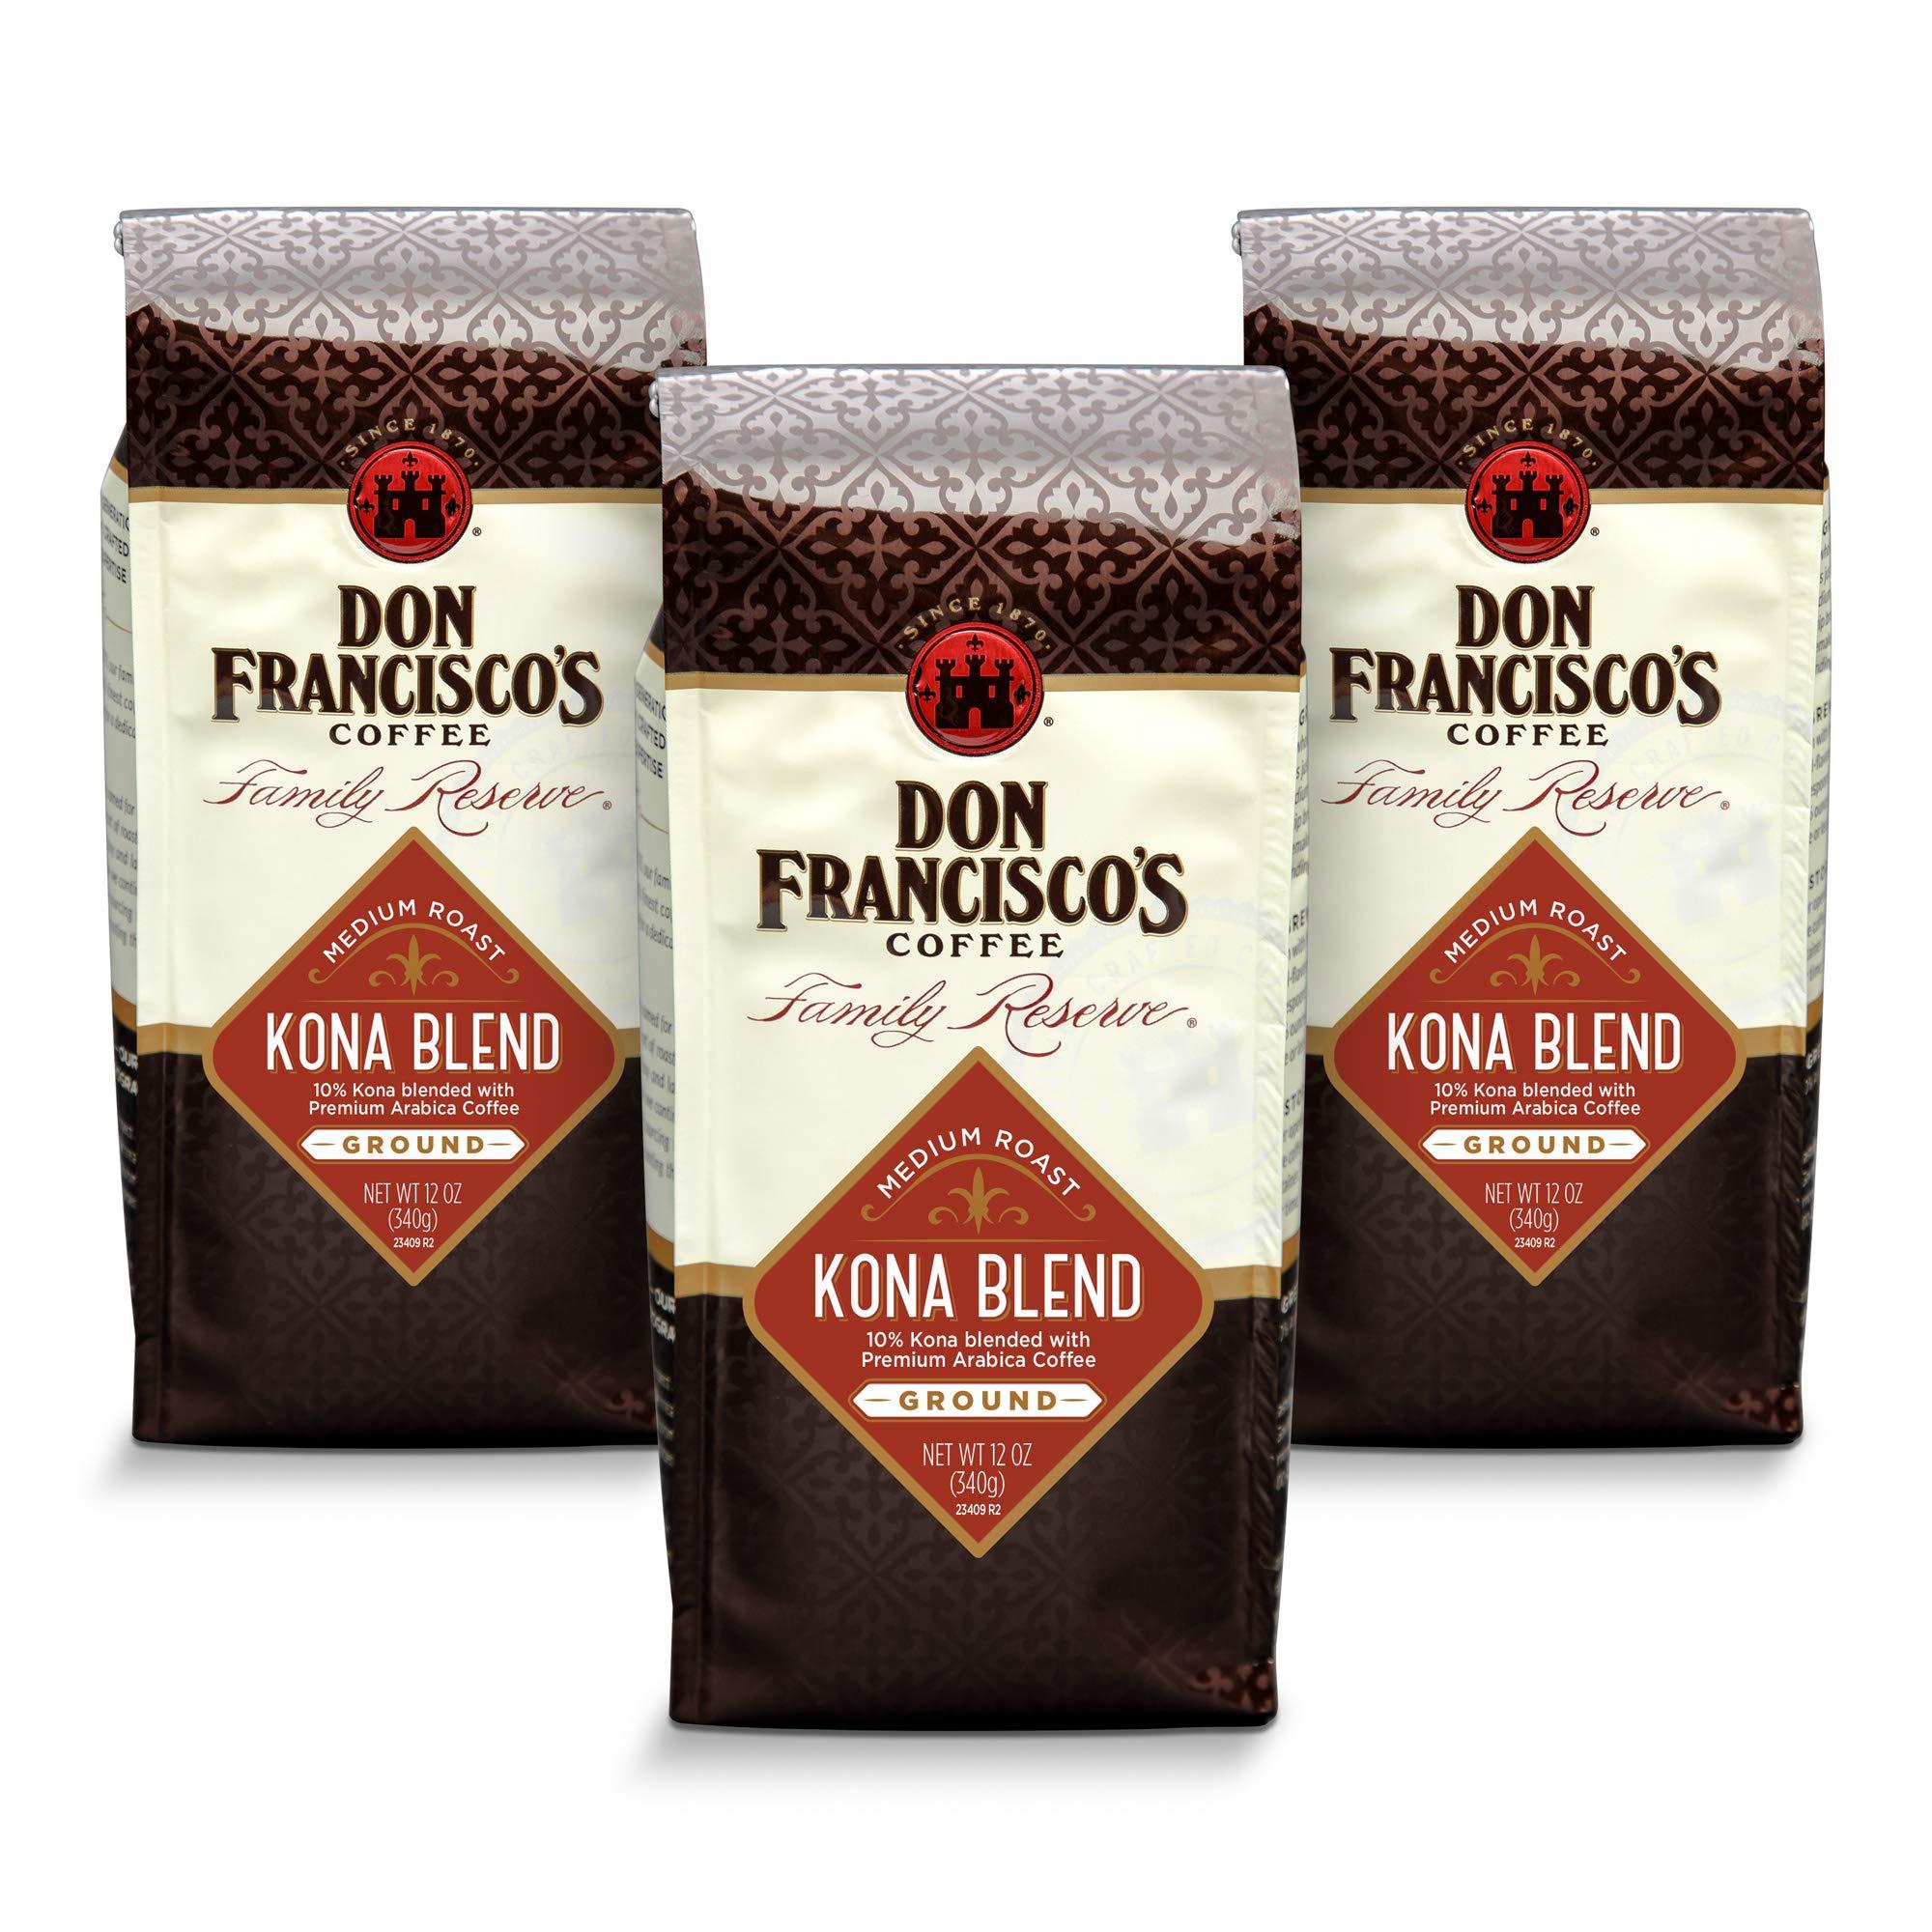 Don Francisco's Kona Blend Ground Coffee, 100% Percent Arabica ( 3 x 12 Ounce bags)